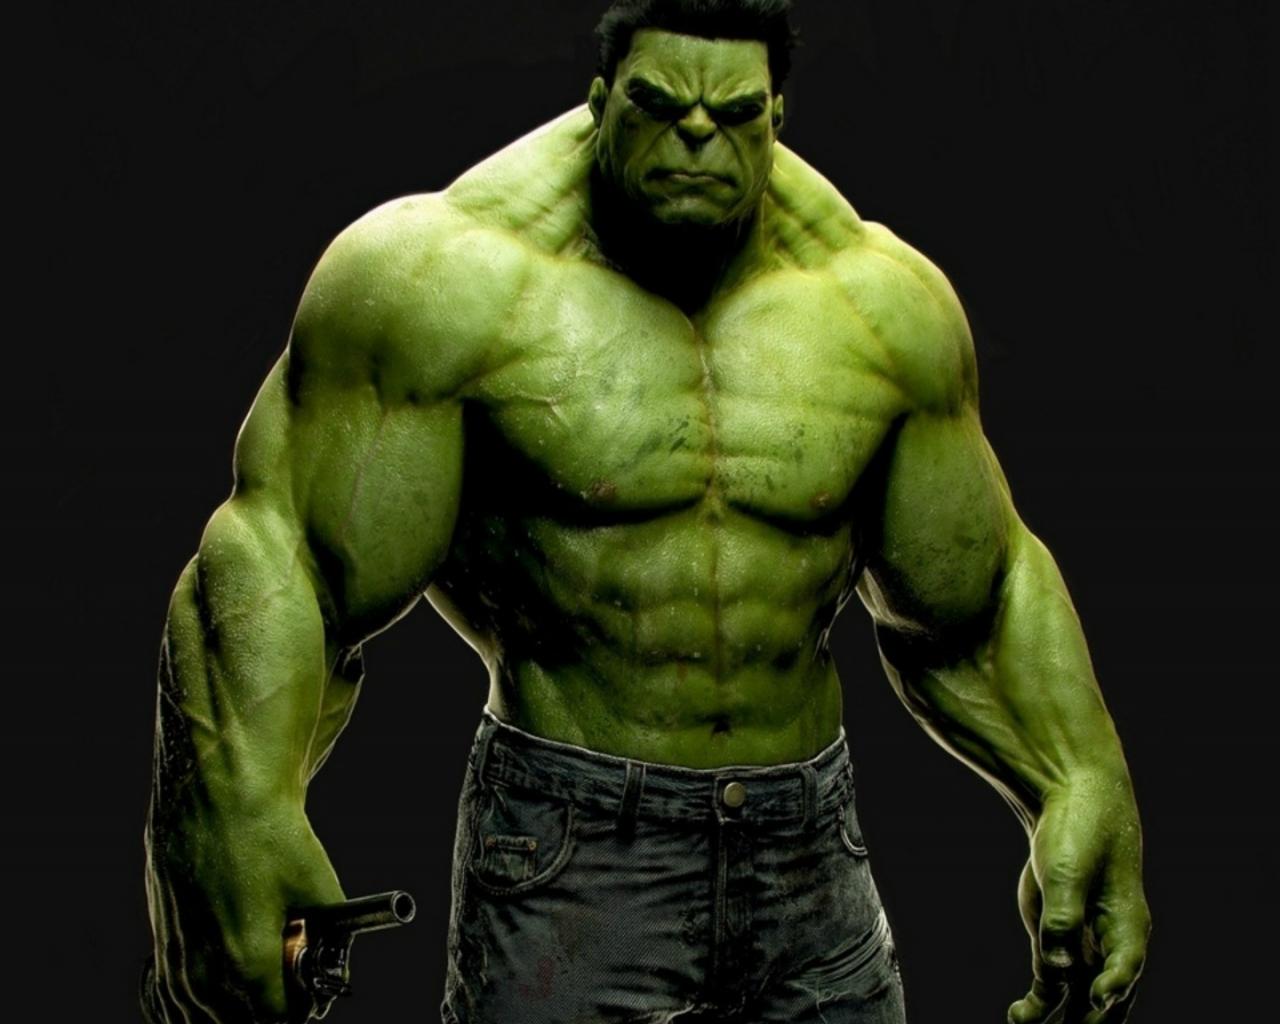 1440x1280px Hulk Live Wallpaper